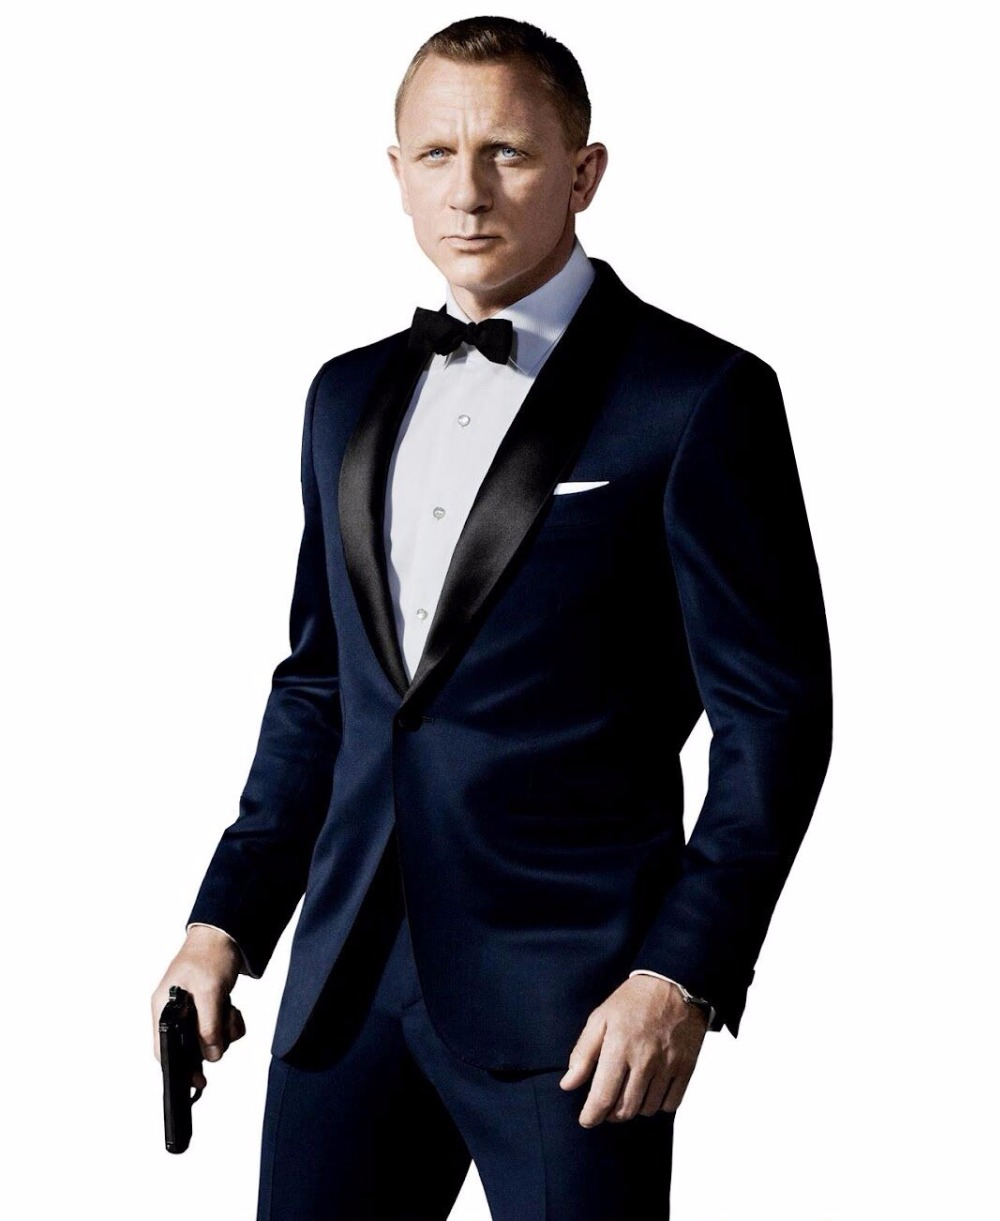 Aliexpress.com : Buy Custom Made Dark Blue Tuxedo Inspired By Suit ...